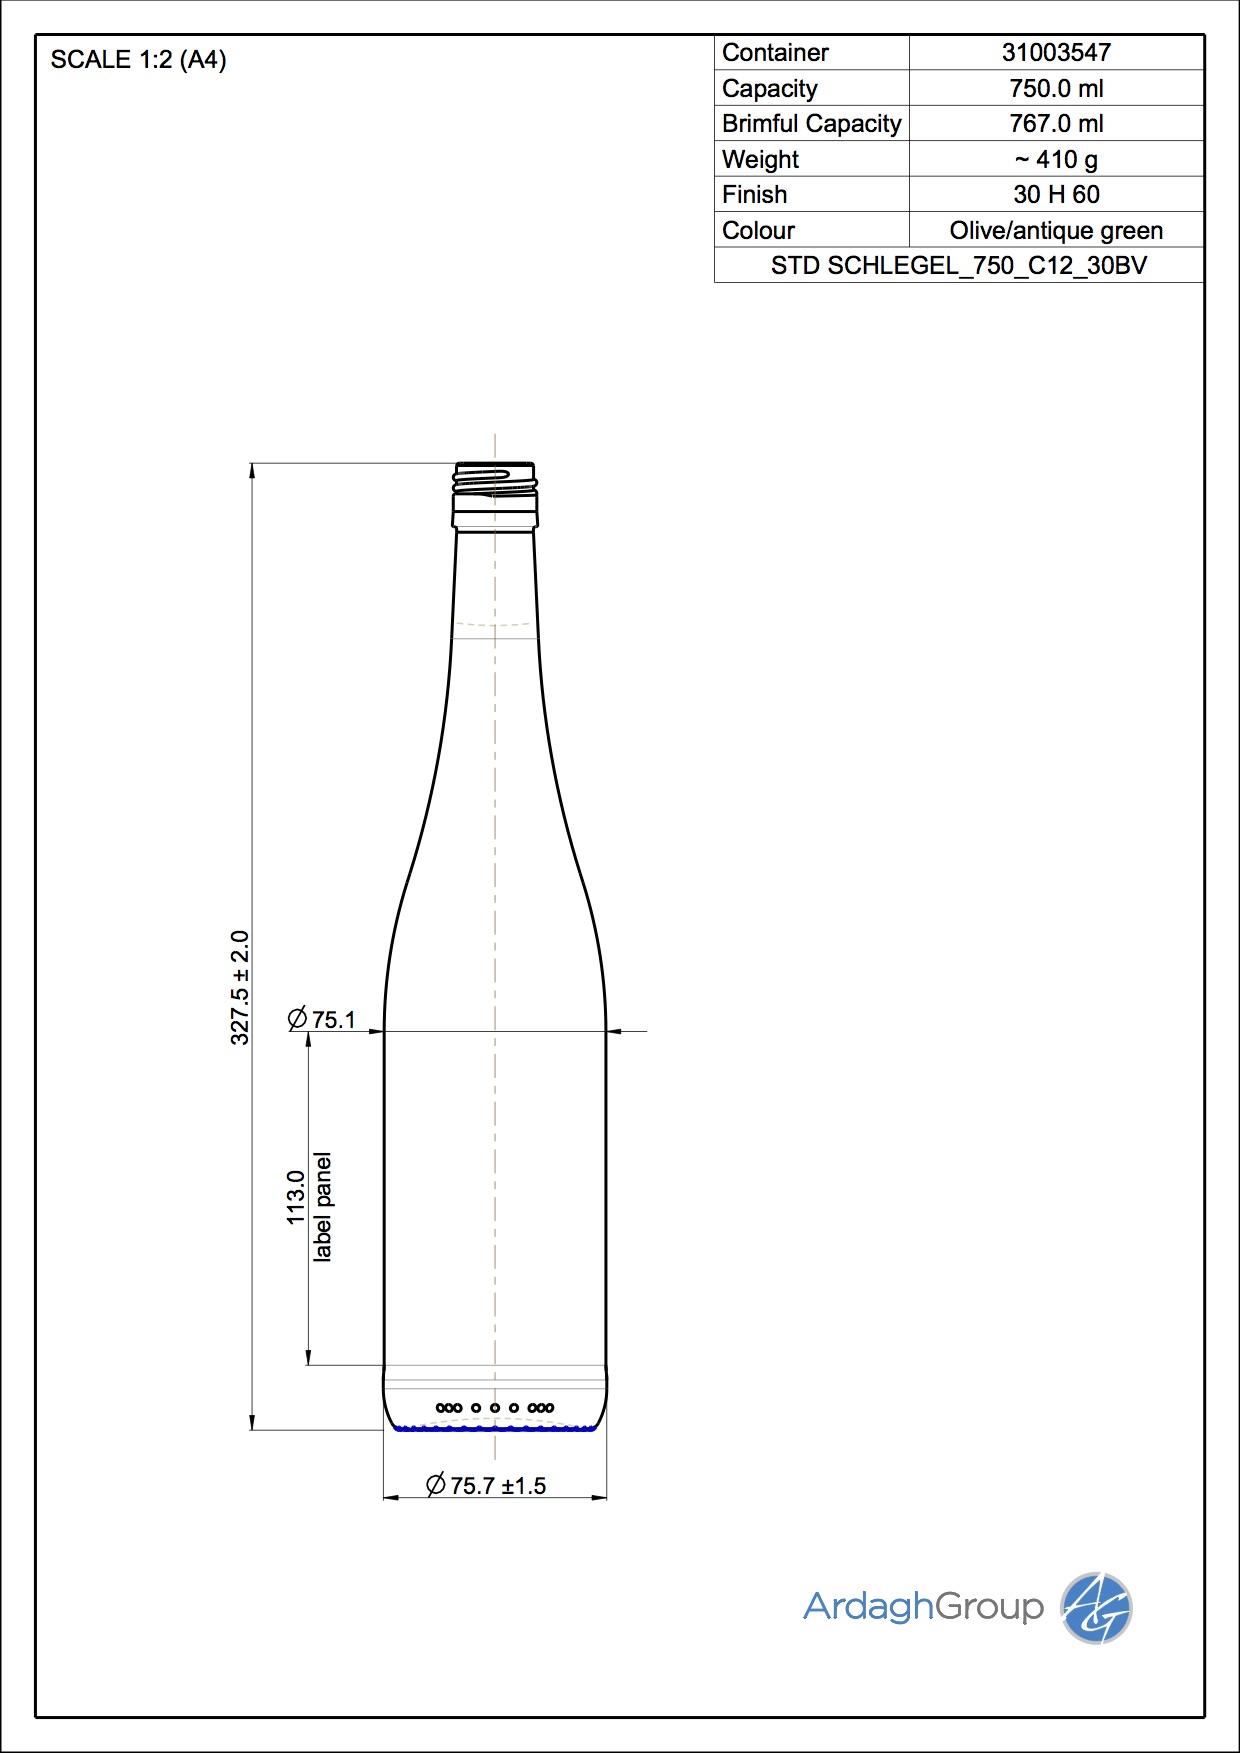 STD SCHLEGEL_750_C12_30BV